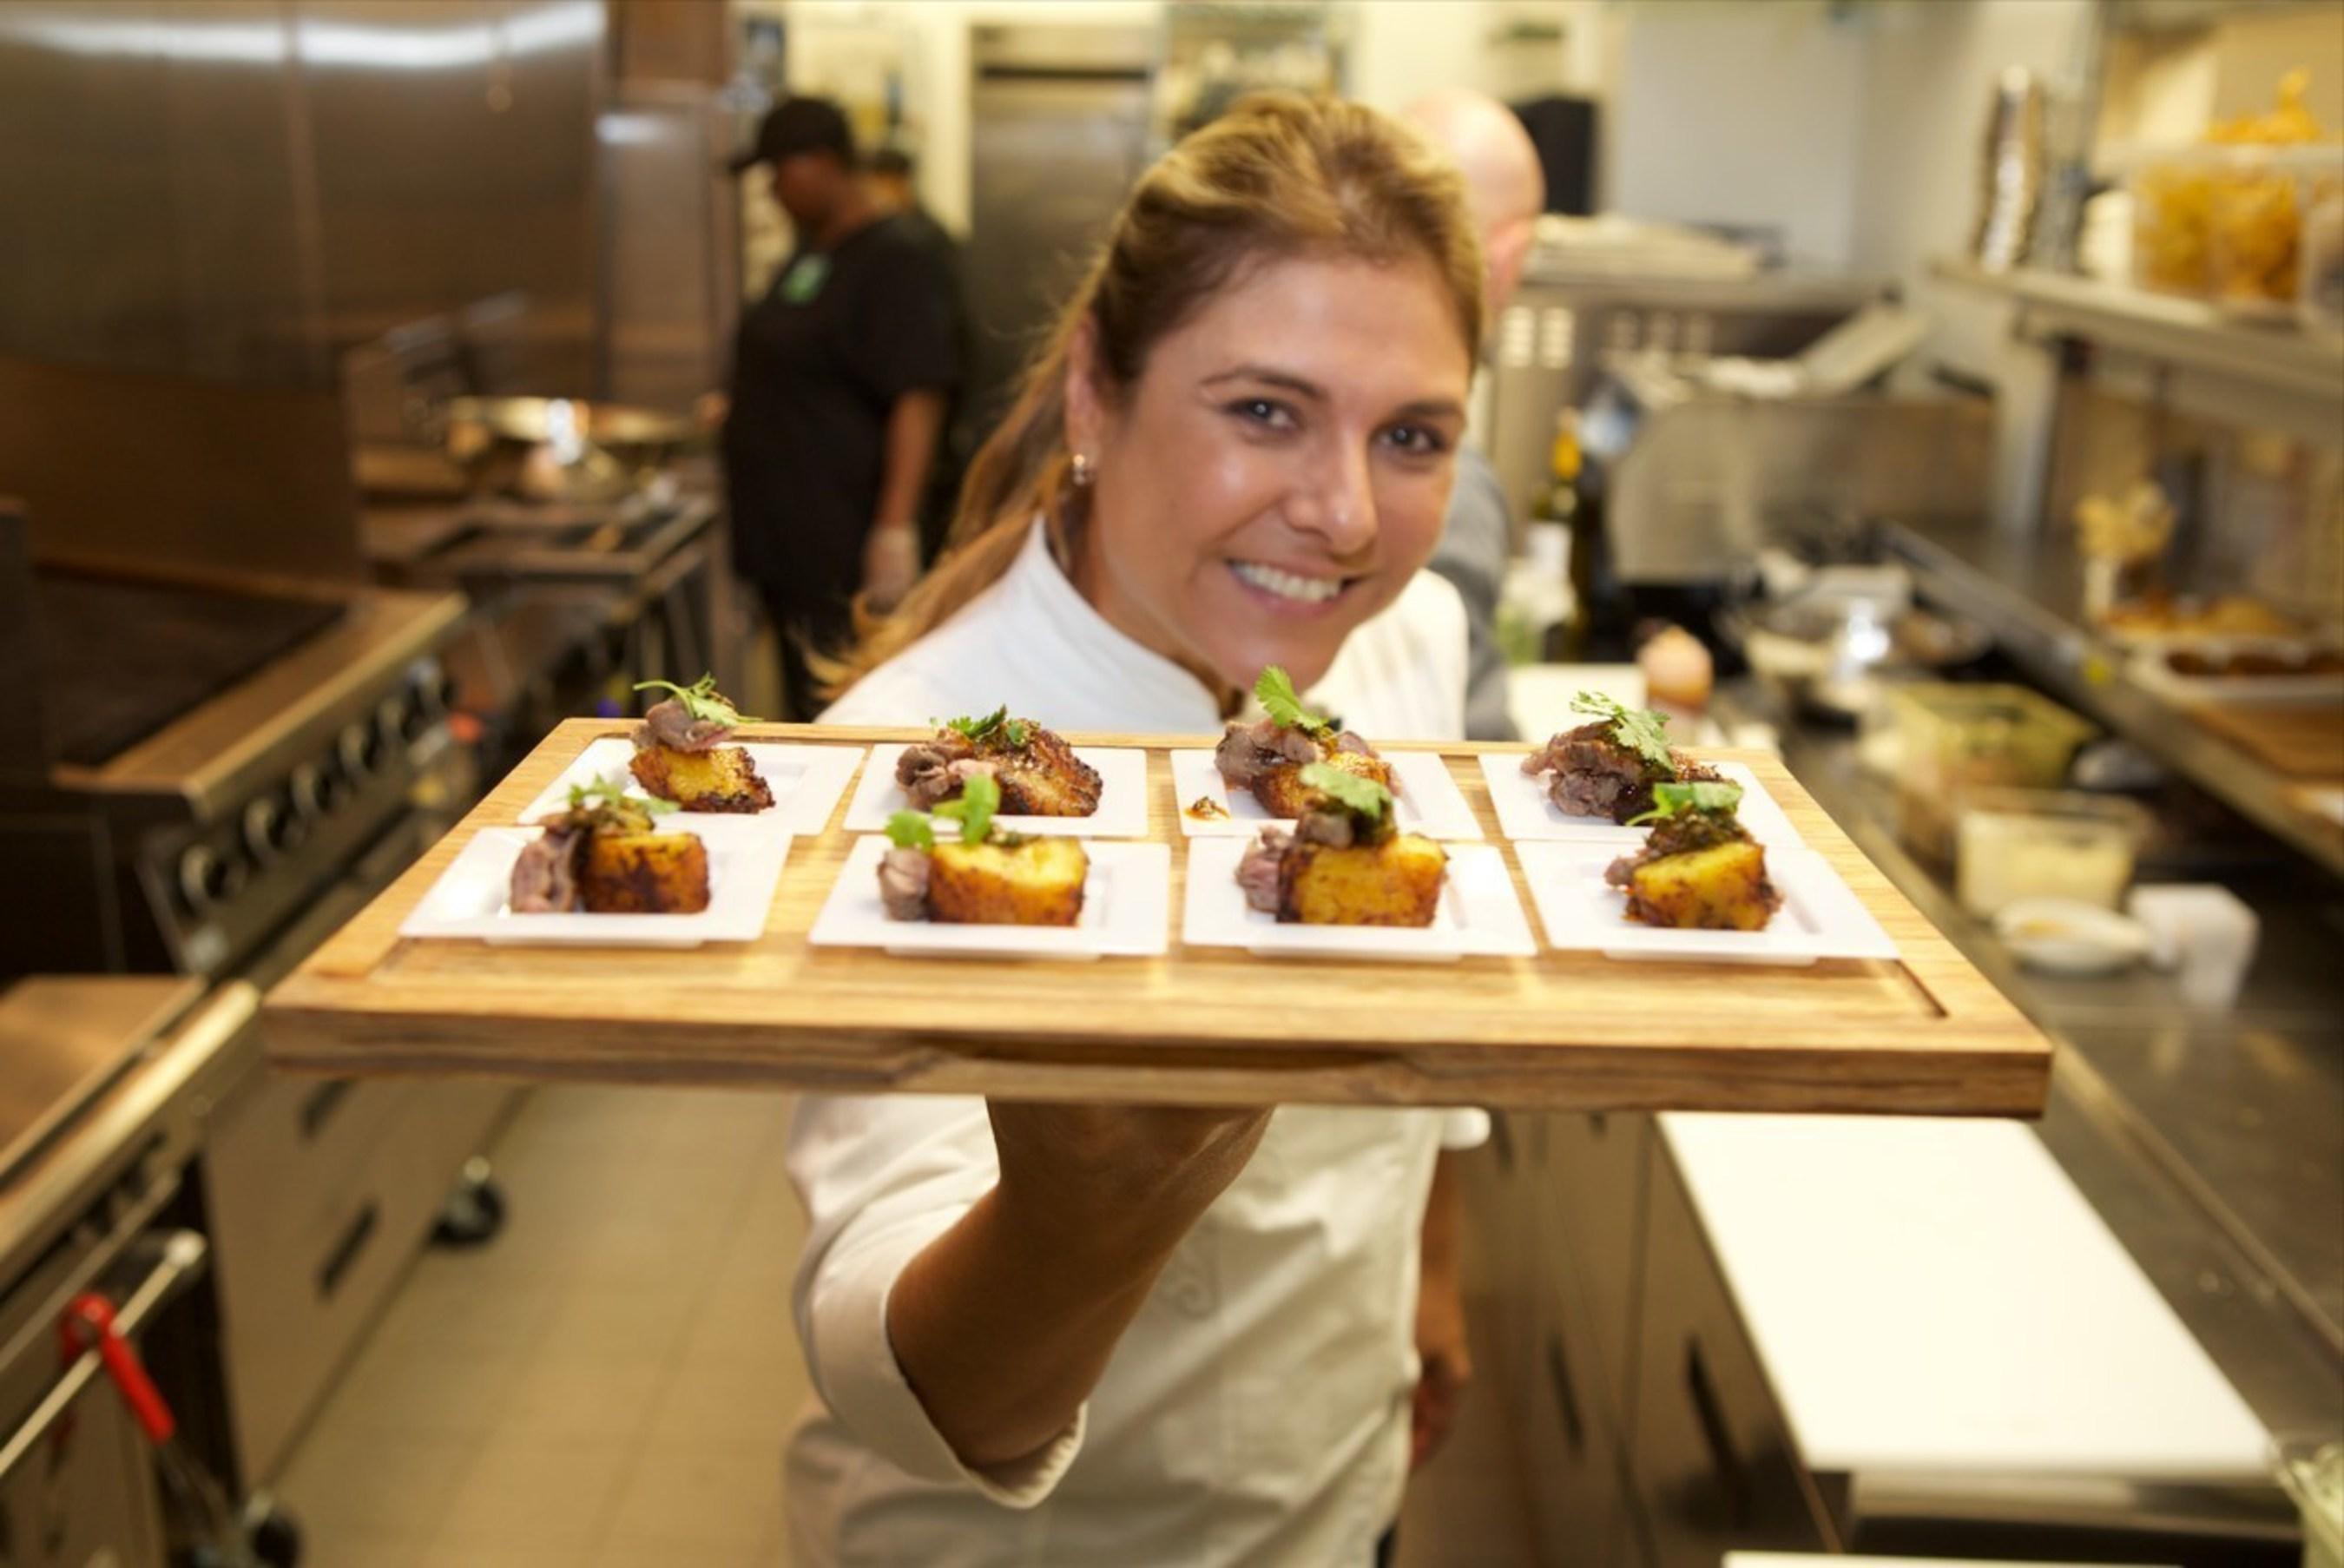 Chef Lorena Garcia showing off her vibrant menu of Tapas